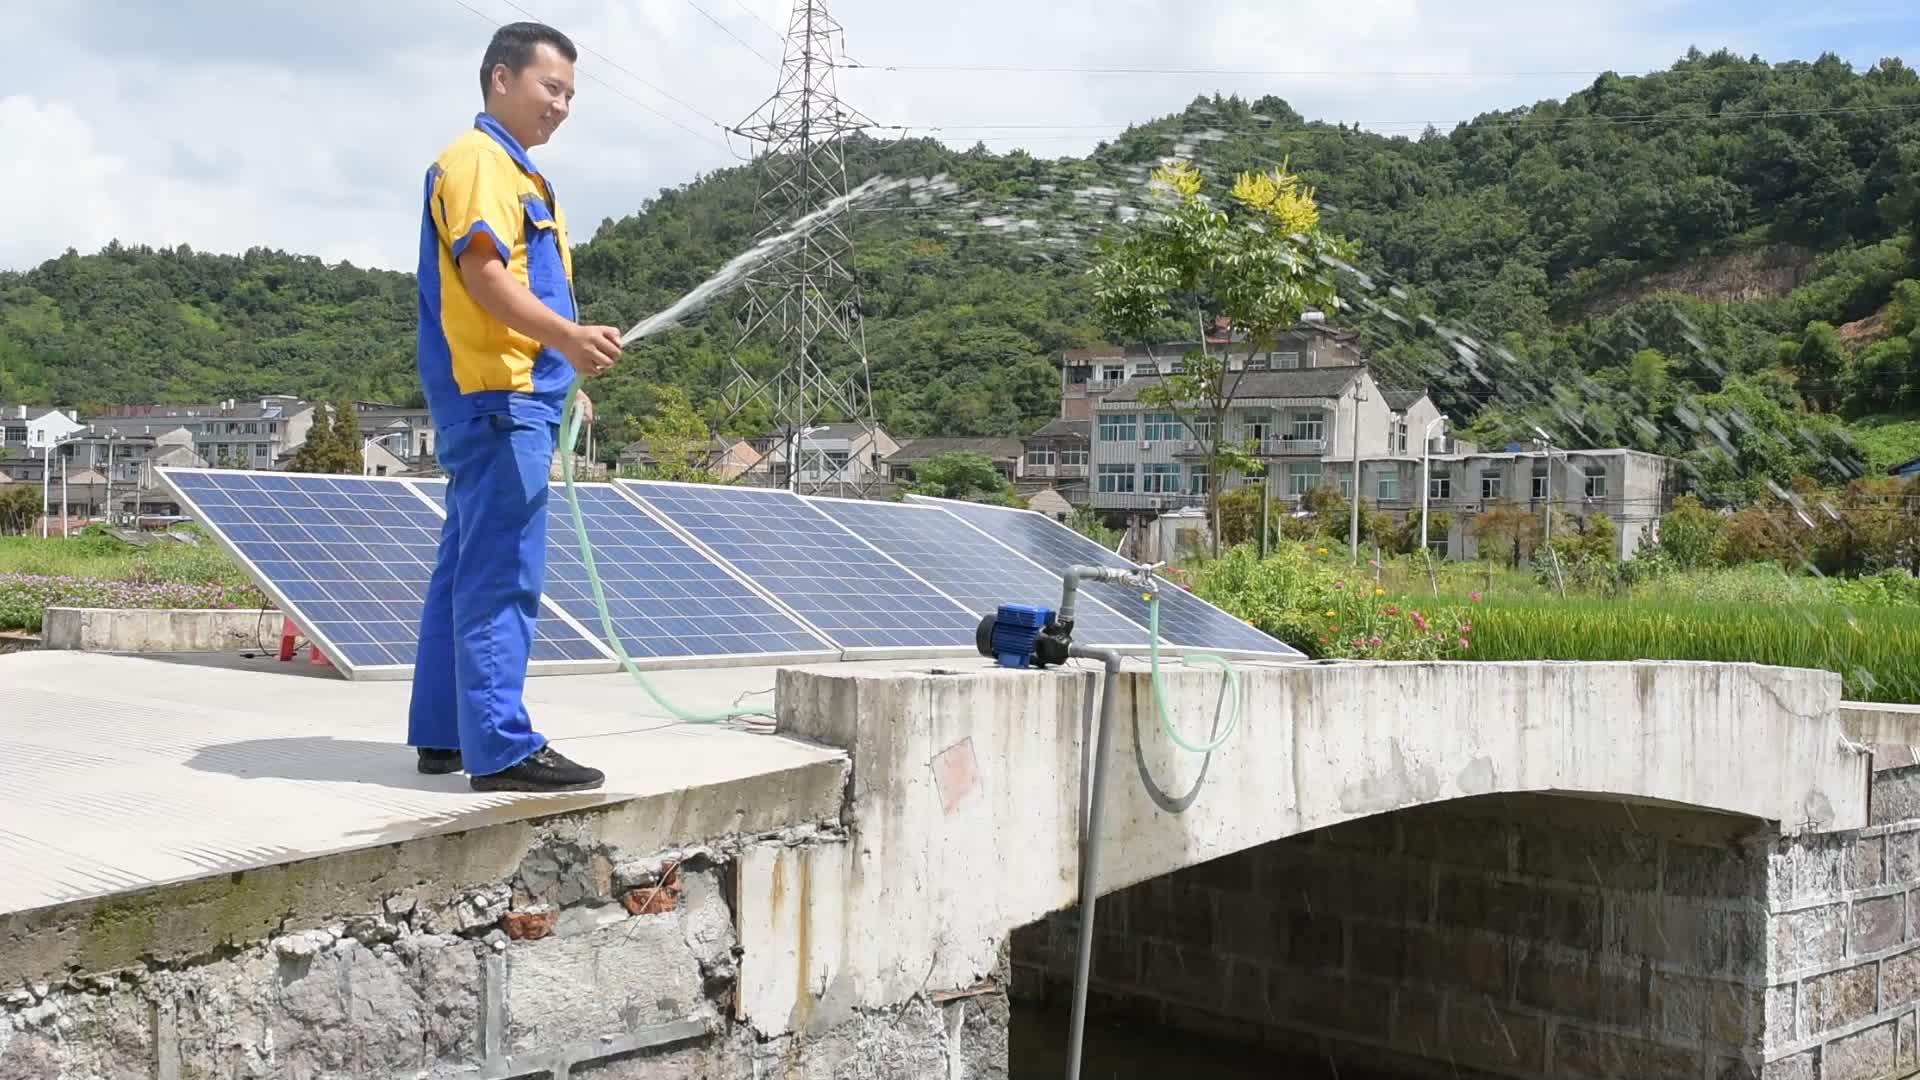 Larens 24 โวลต์ QB series พลังงานแสงอาทิตย์ dc พื้นผิว booster pump - สร้าง controller